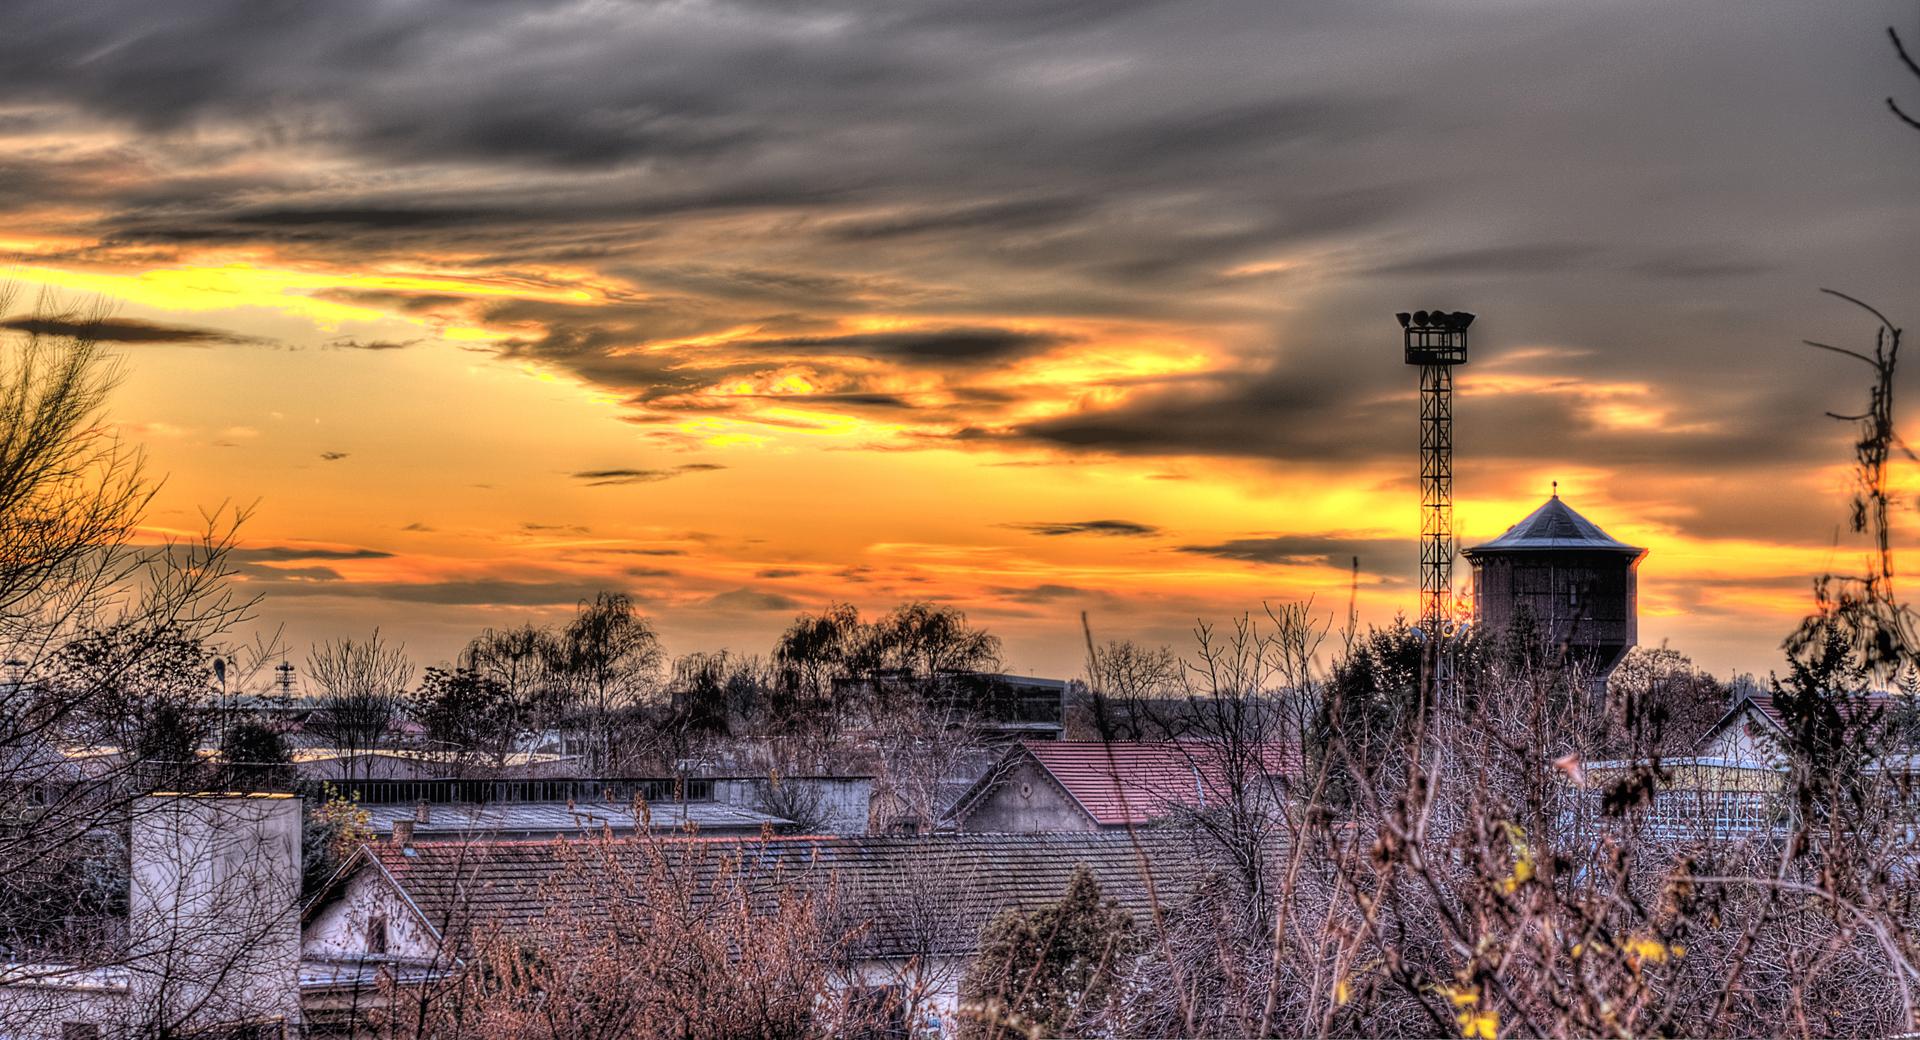 Mrazovito jutro  Foto: Marin Lončar  Ključne riječi: mraz jutro nebo